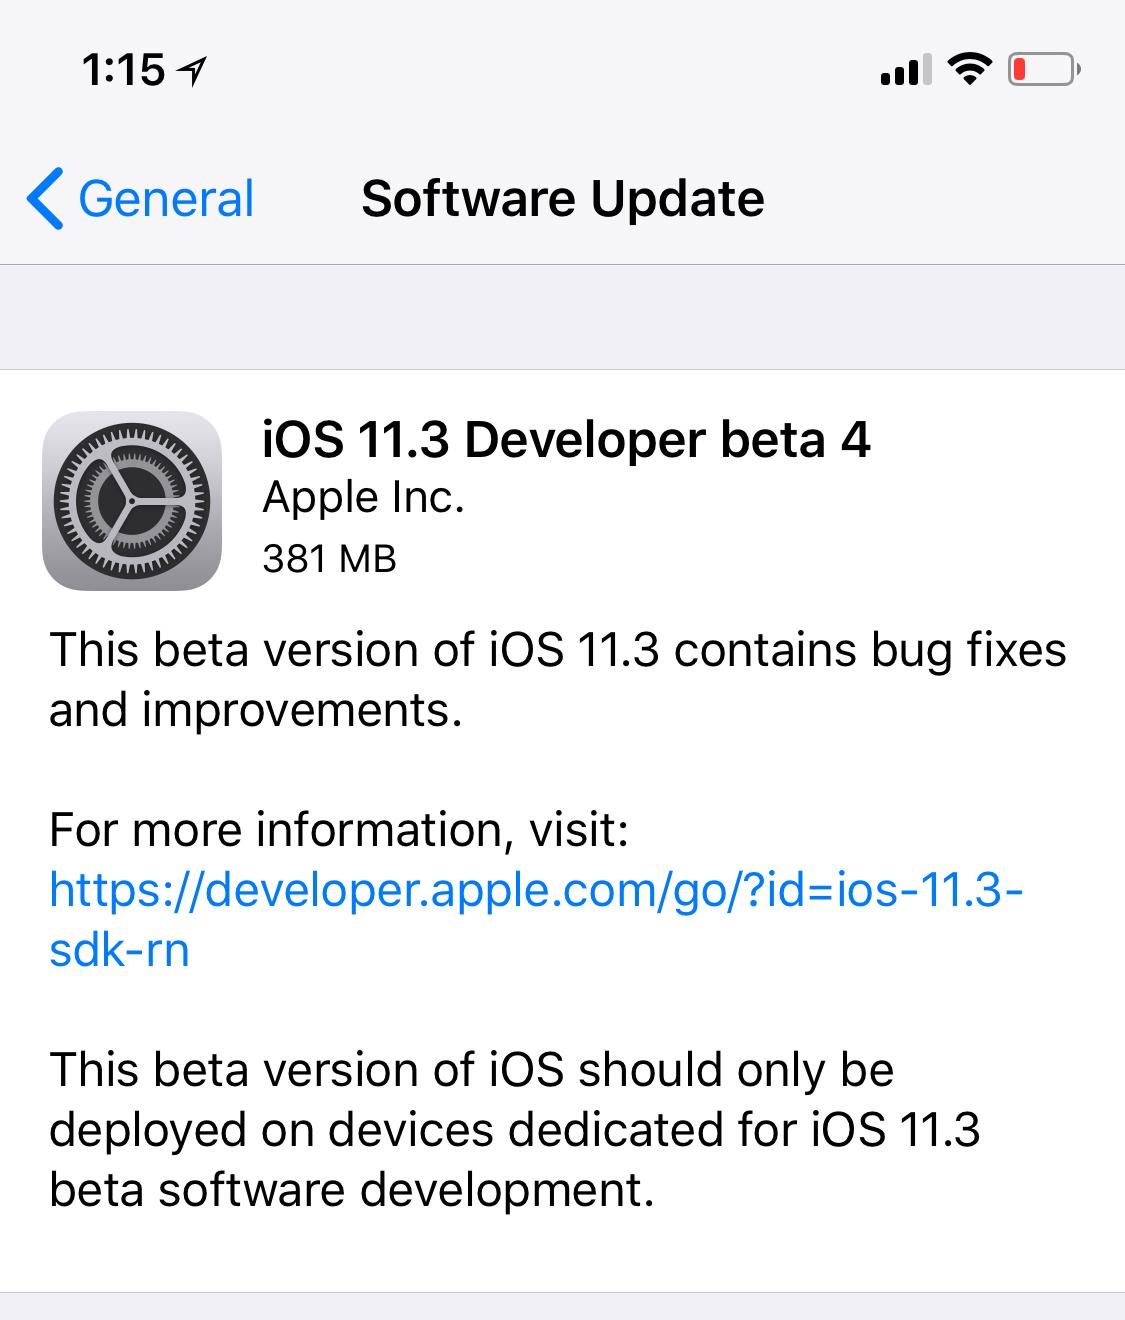 iOS 11.3 Beta 4